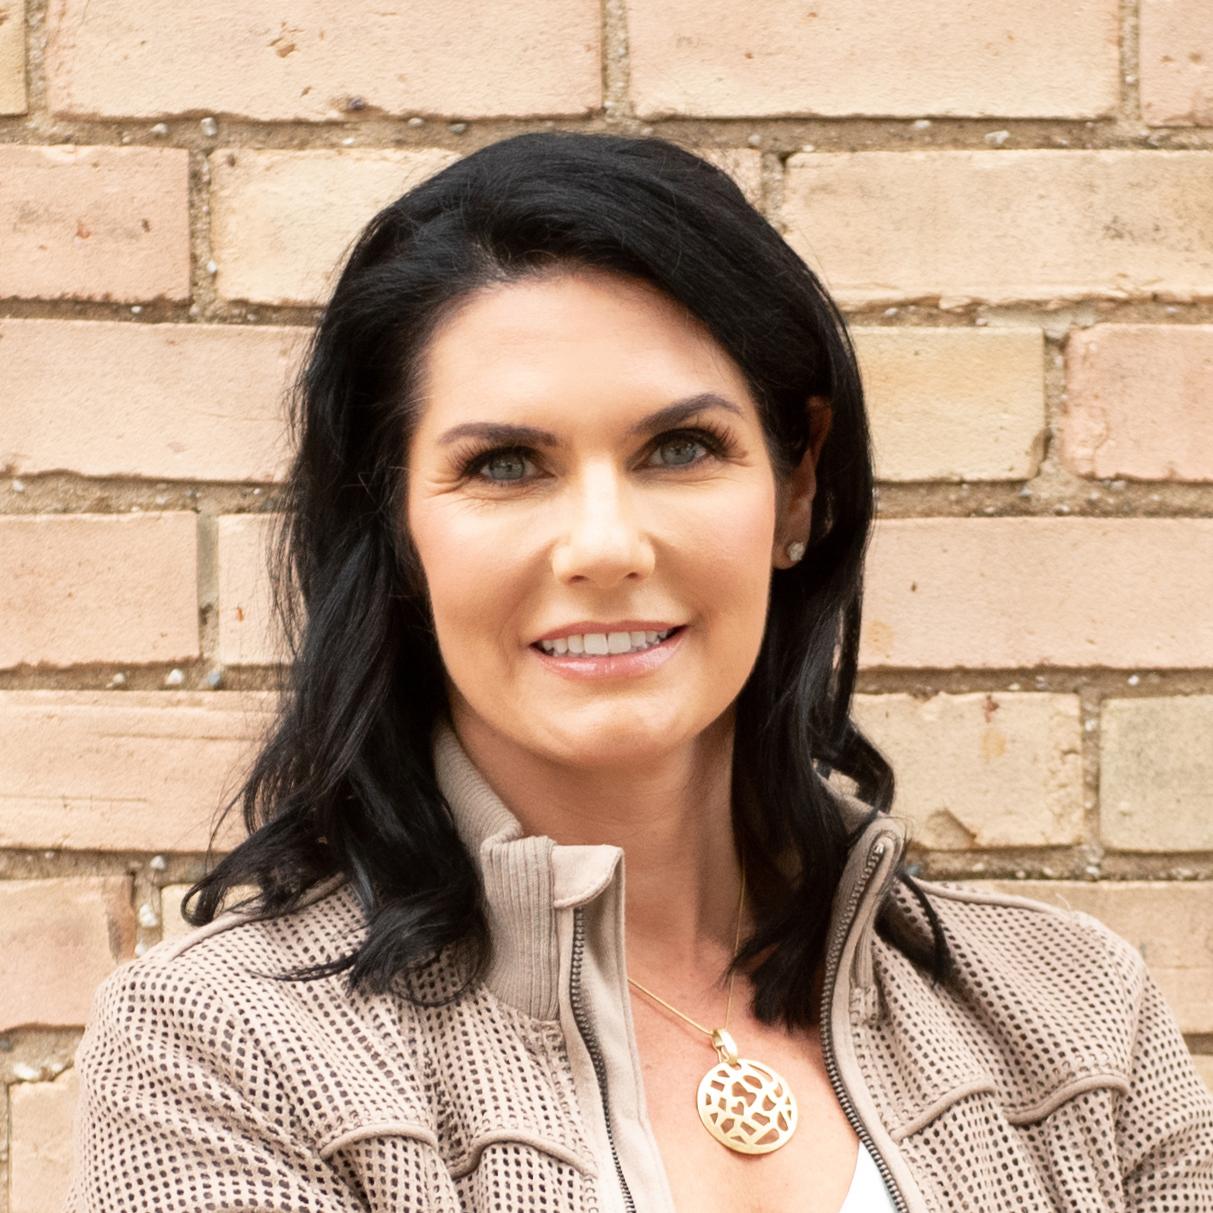 Triniti Gawthrop - Founder, Brand Activate